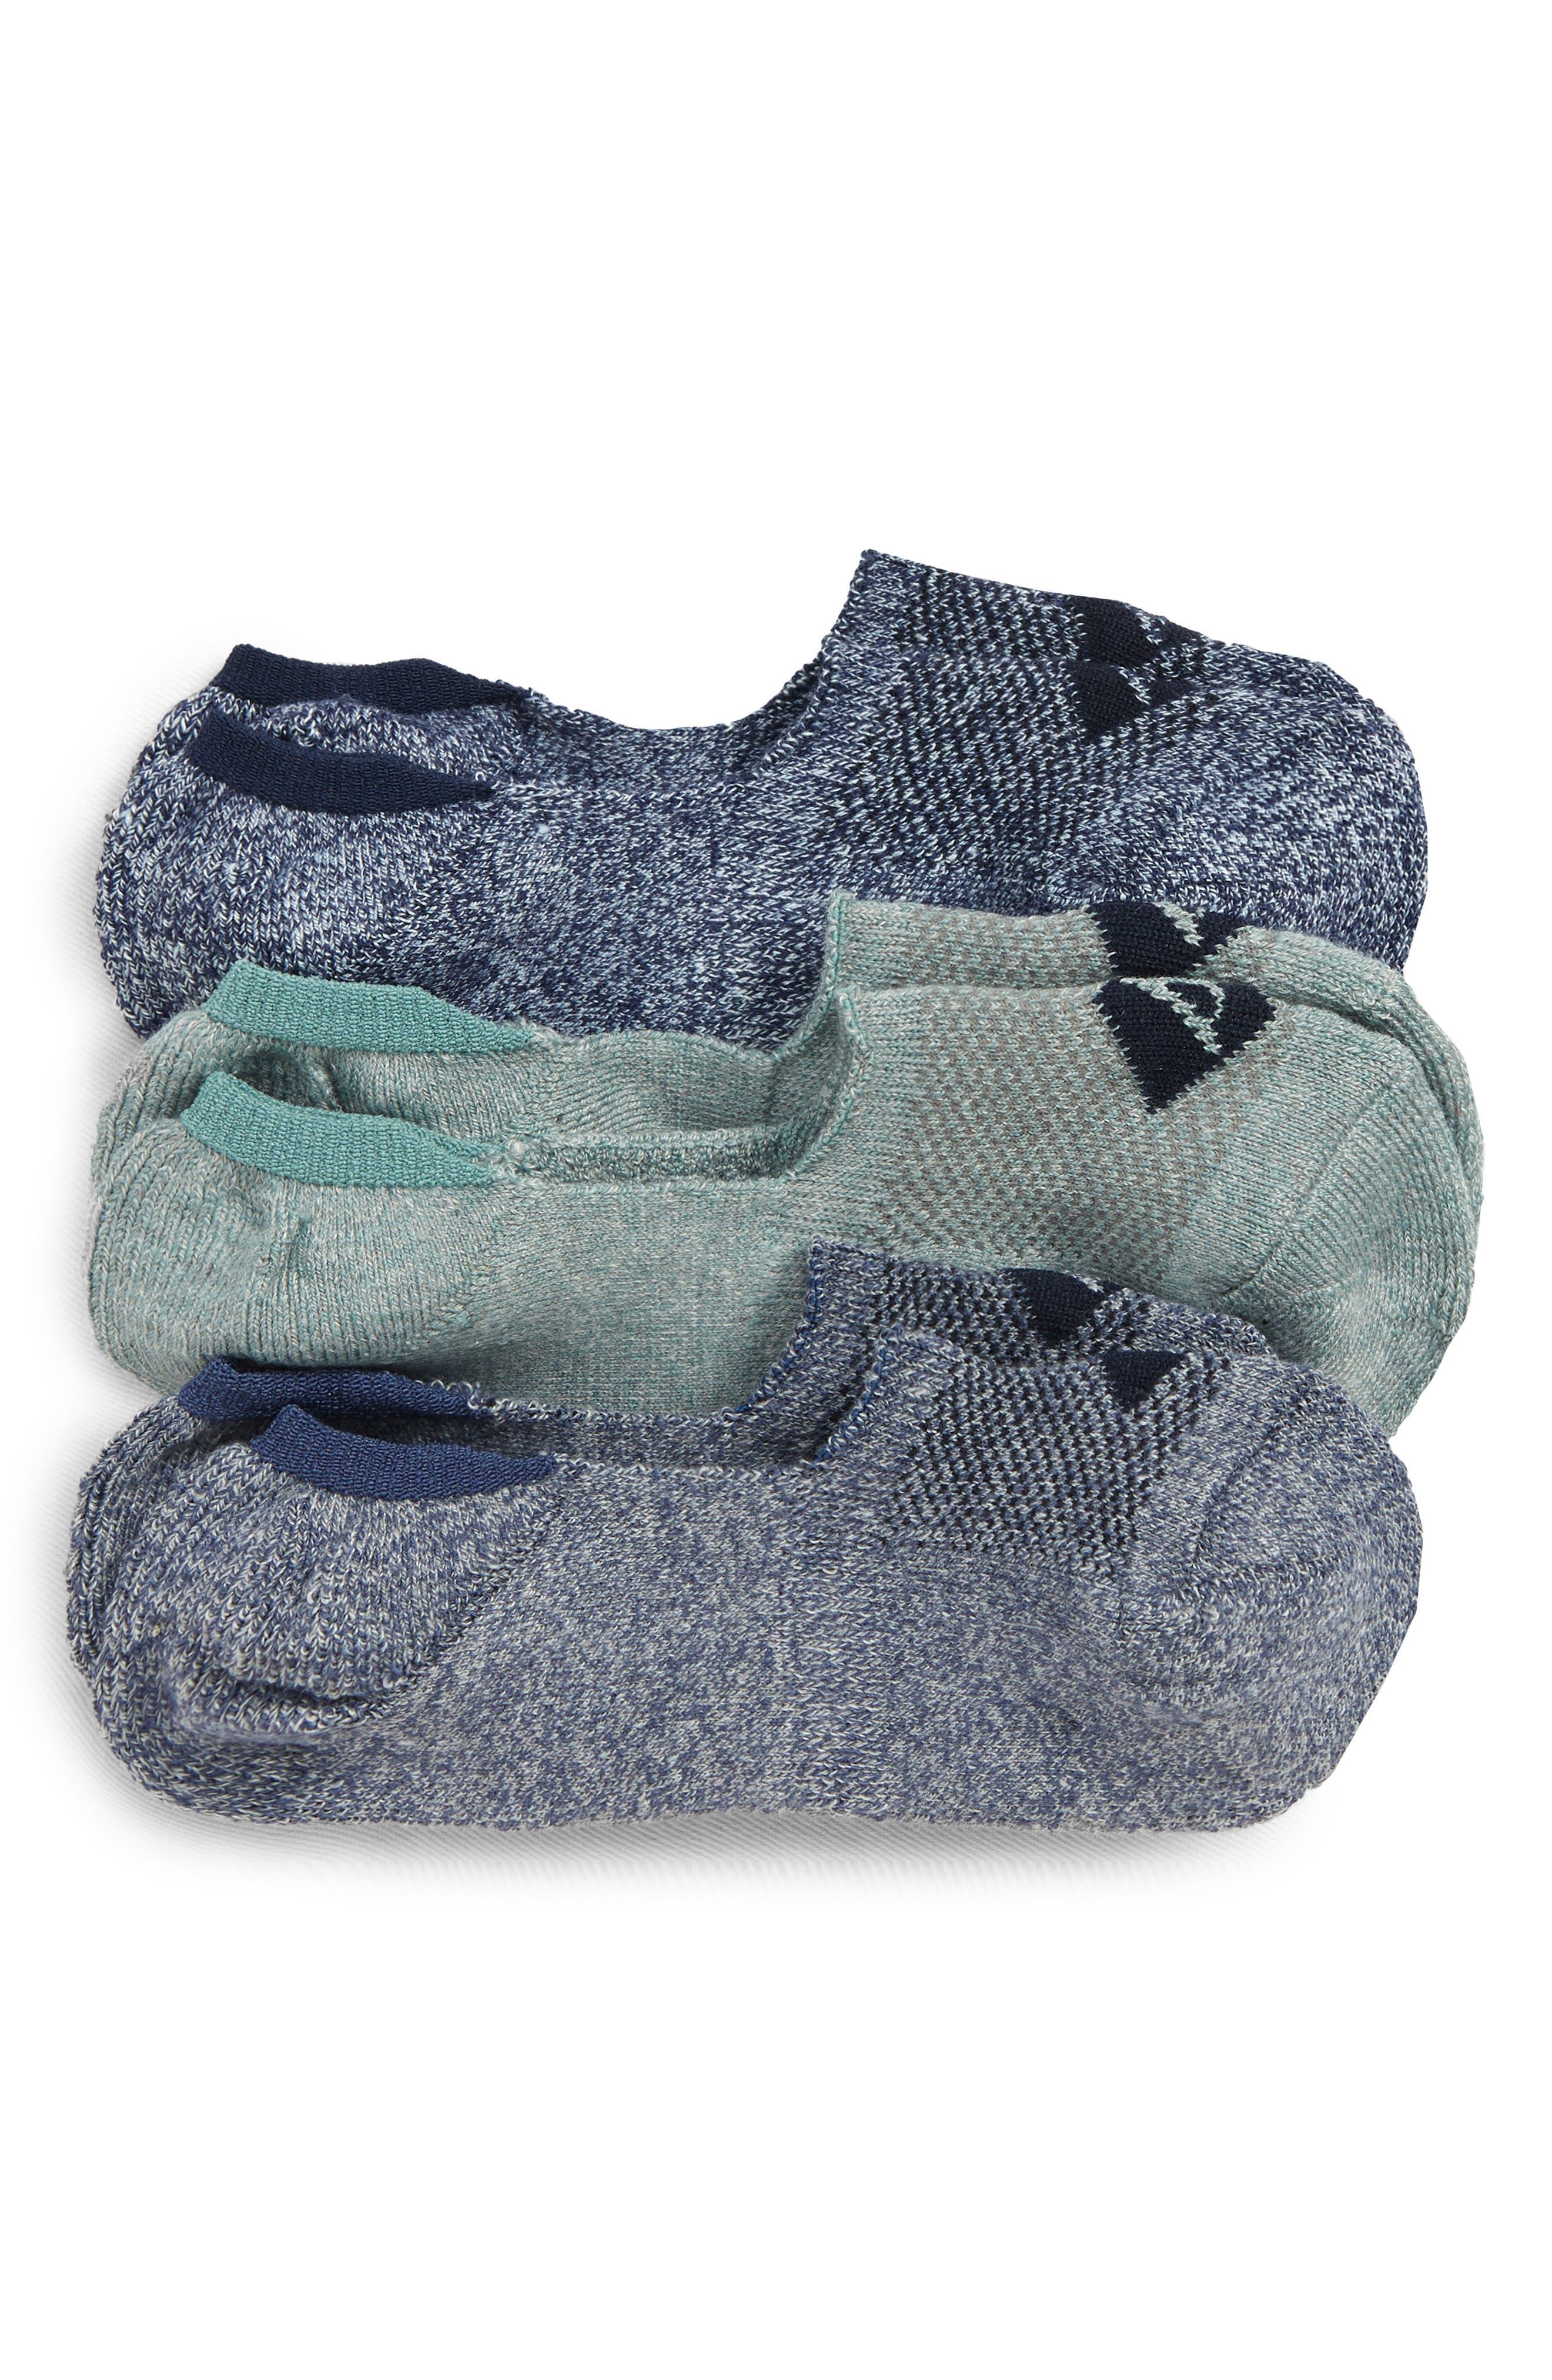 Top-Sider<sup>®</sup> Repreve Assorted 3-Pack Liner Socks, Main, color, NAVY MARL ASST